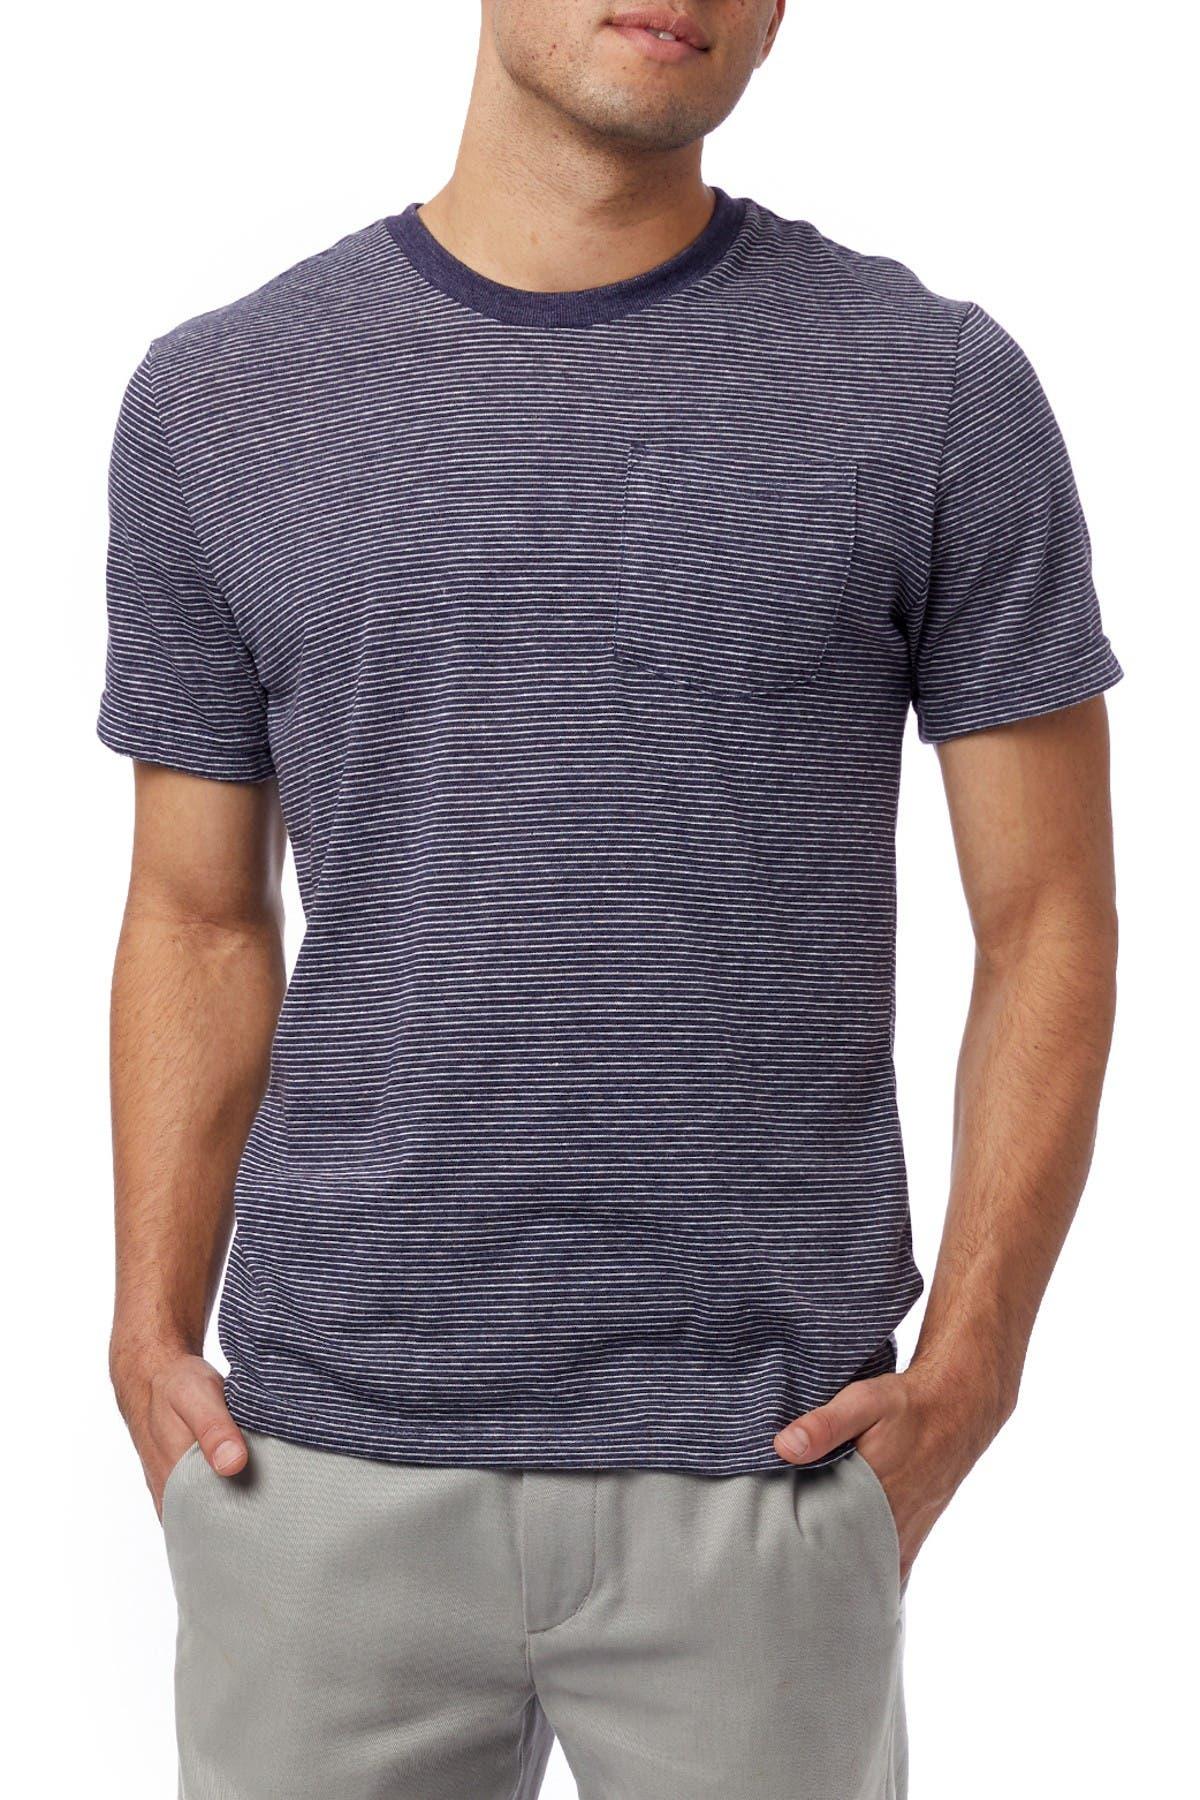 Image of Alternative Striped Pocket T-Shirt